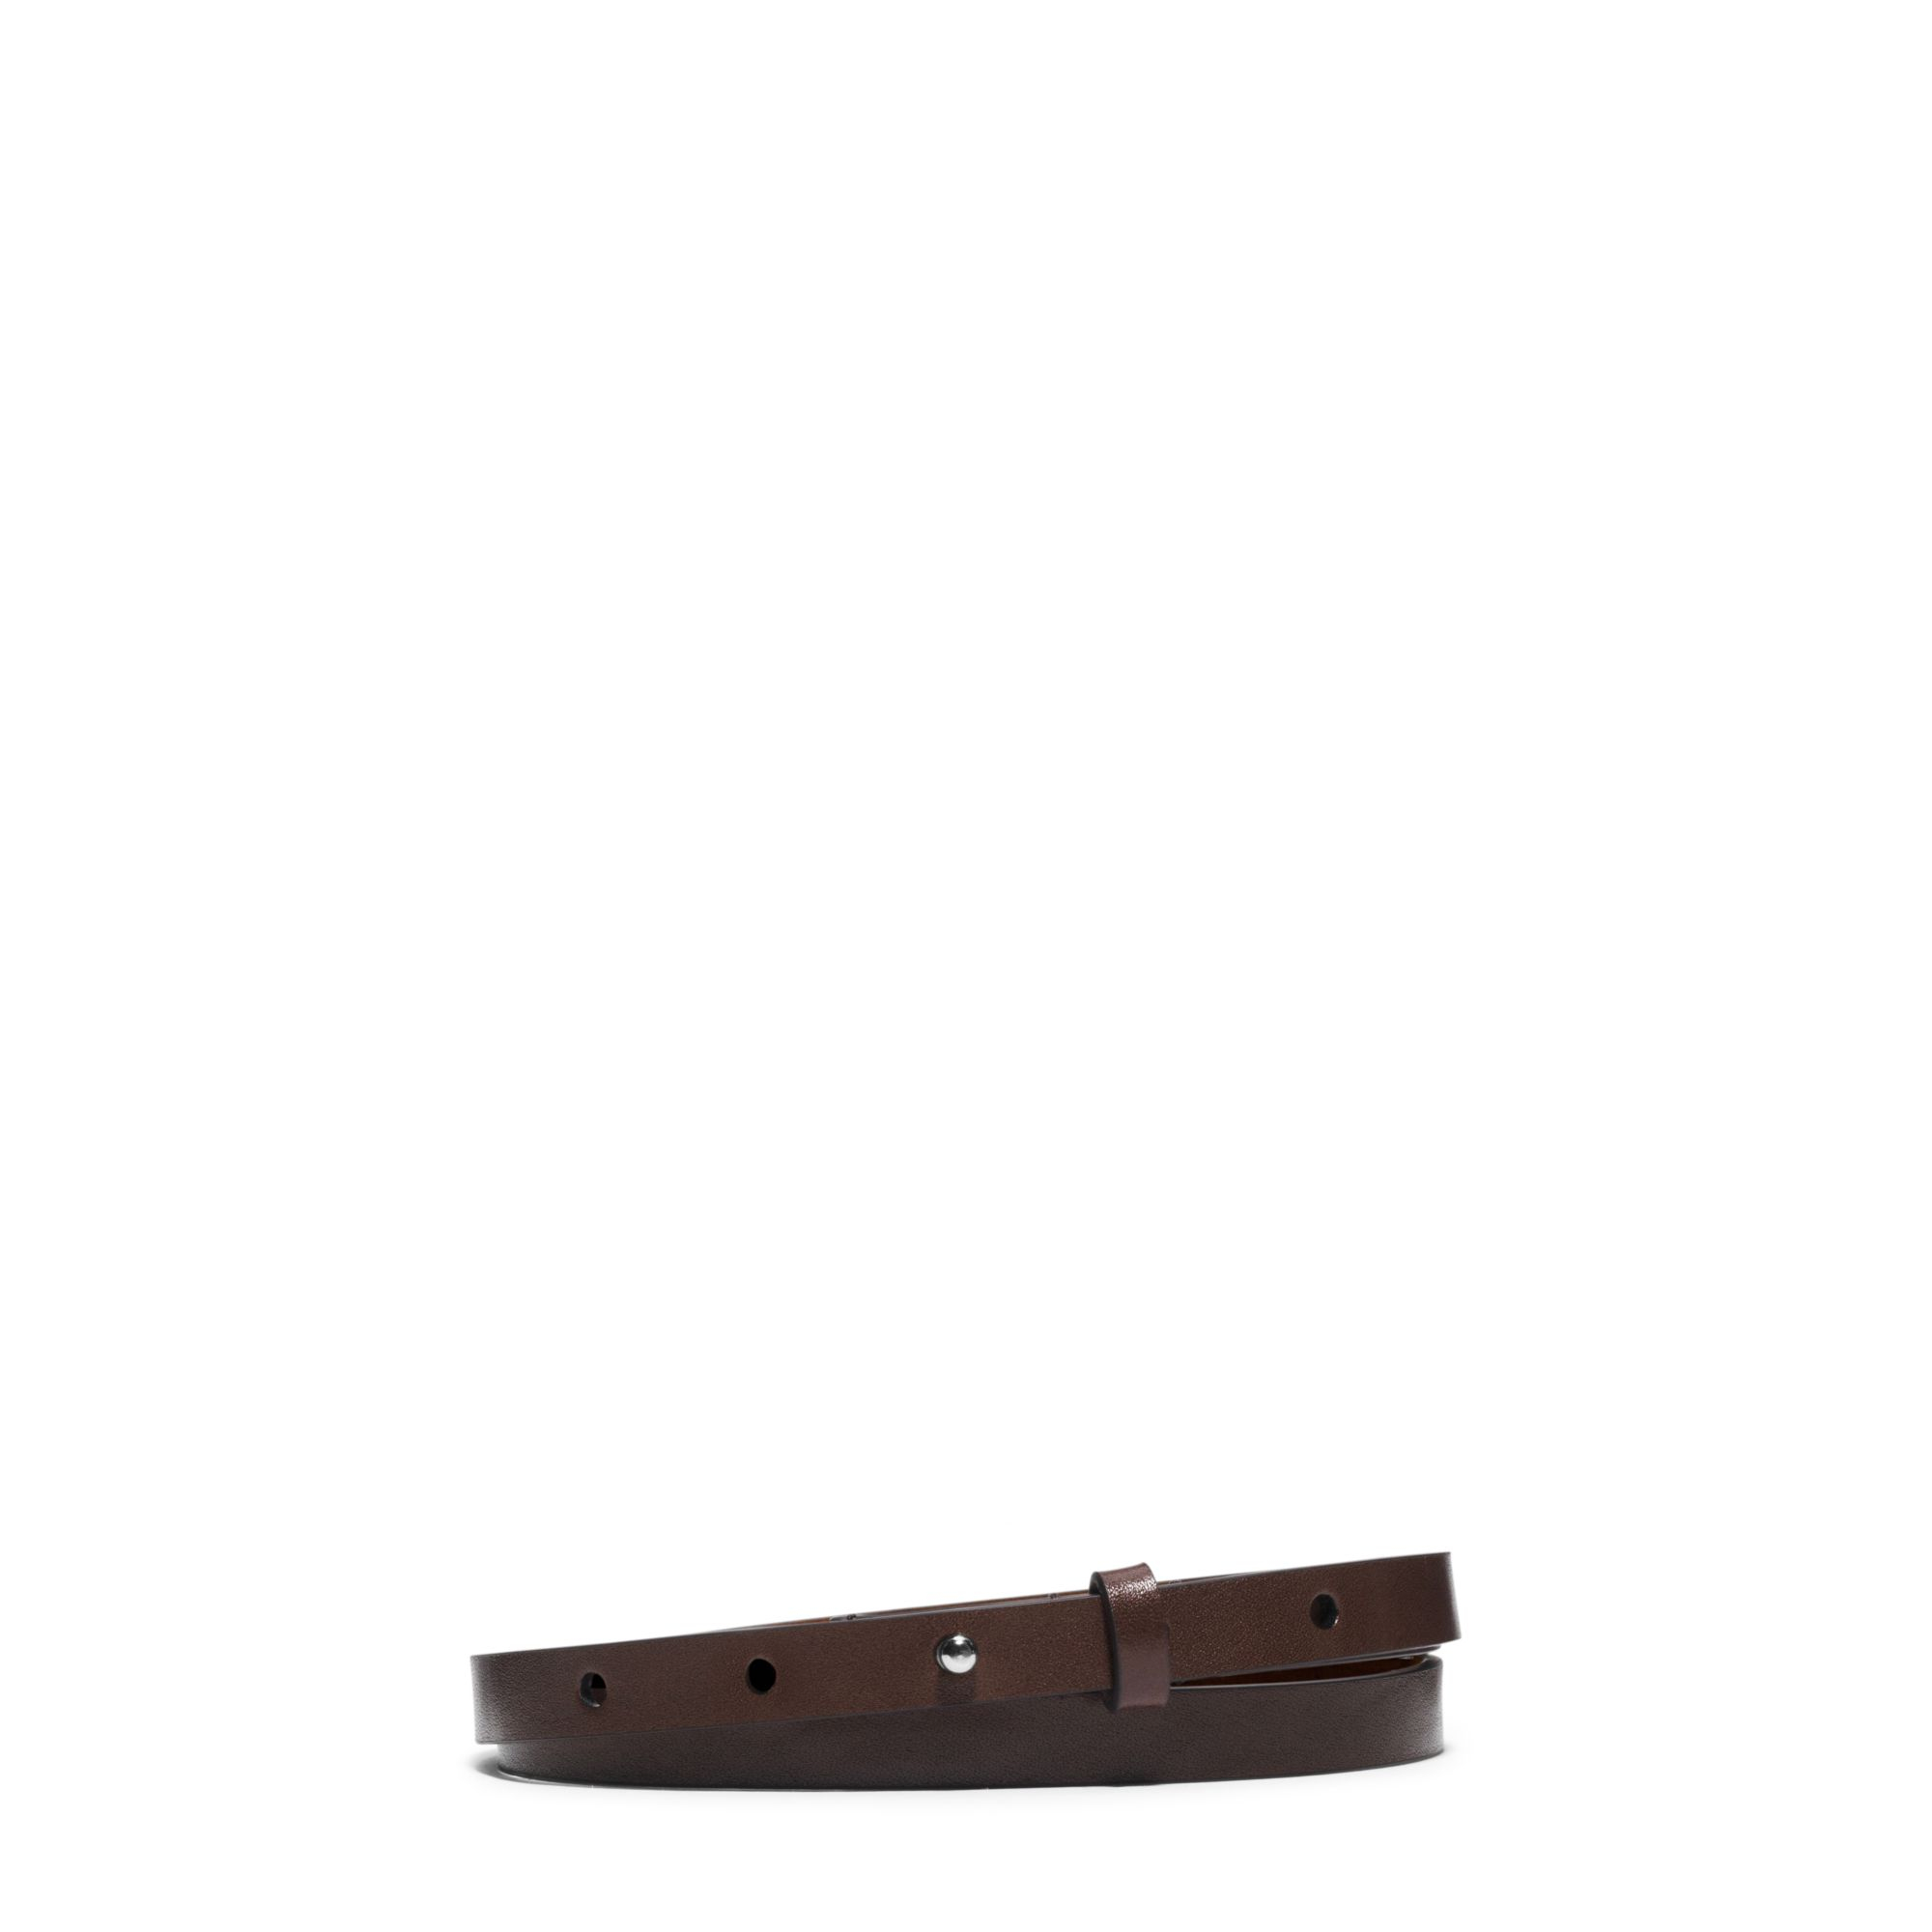 michael kors leather belt in brown lyst